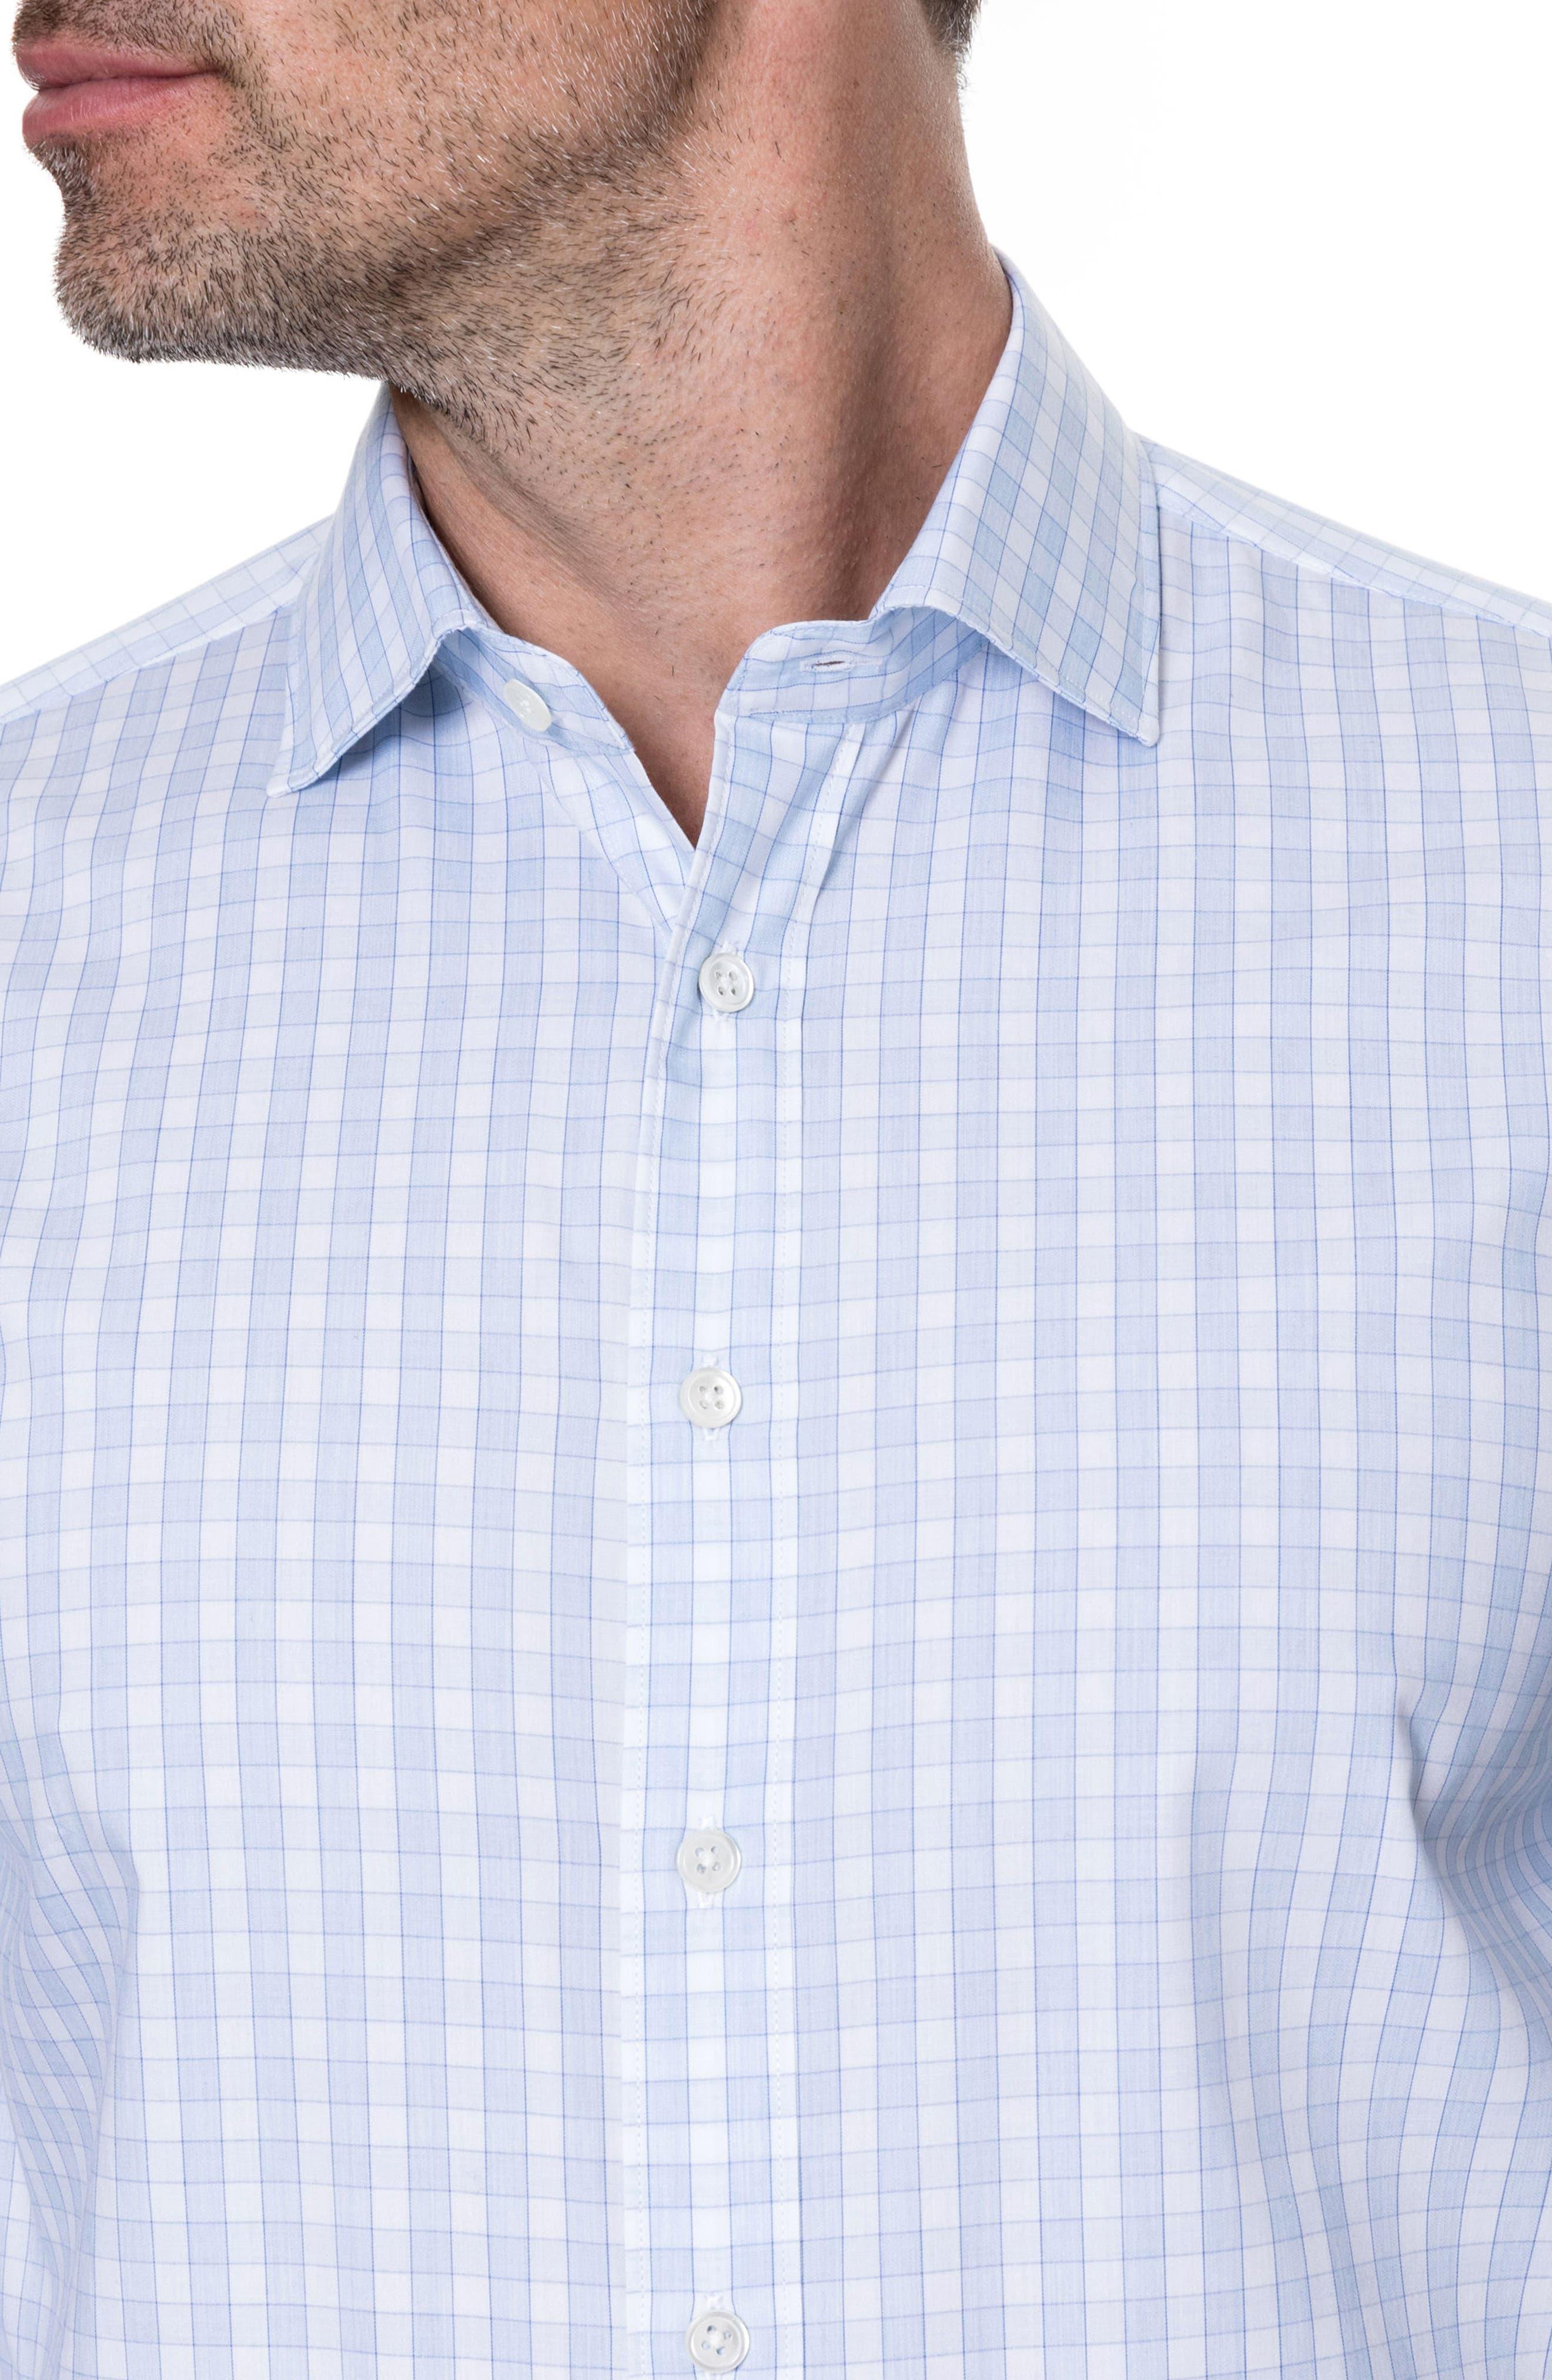 Brackley Slim Fit Sport Shirt,                             Alternate thumbnail 3, color,